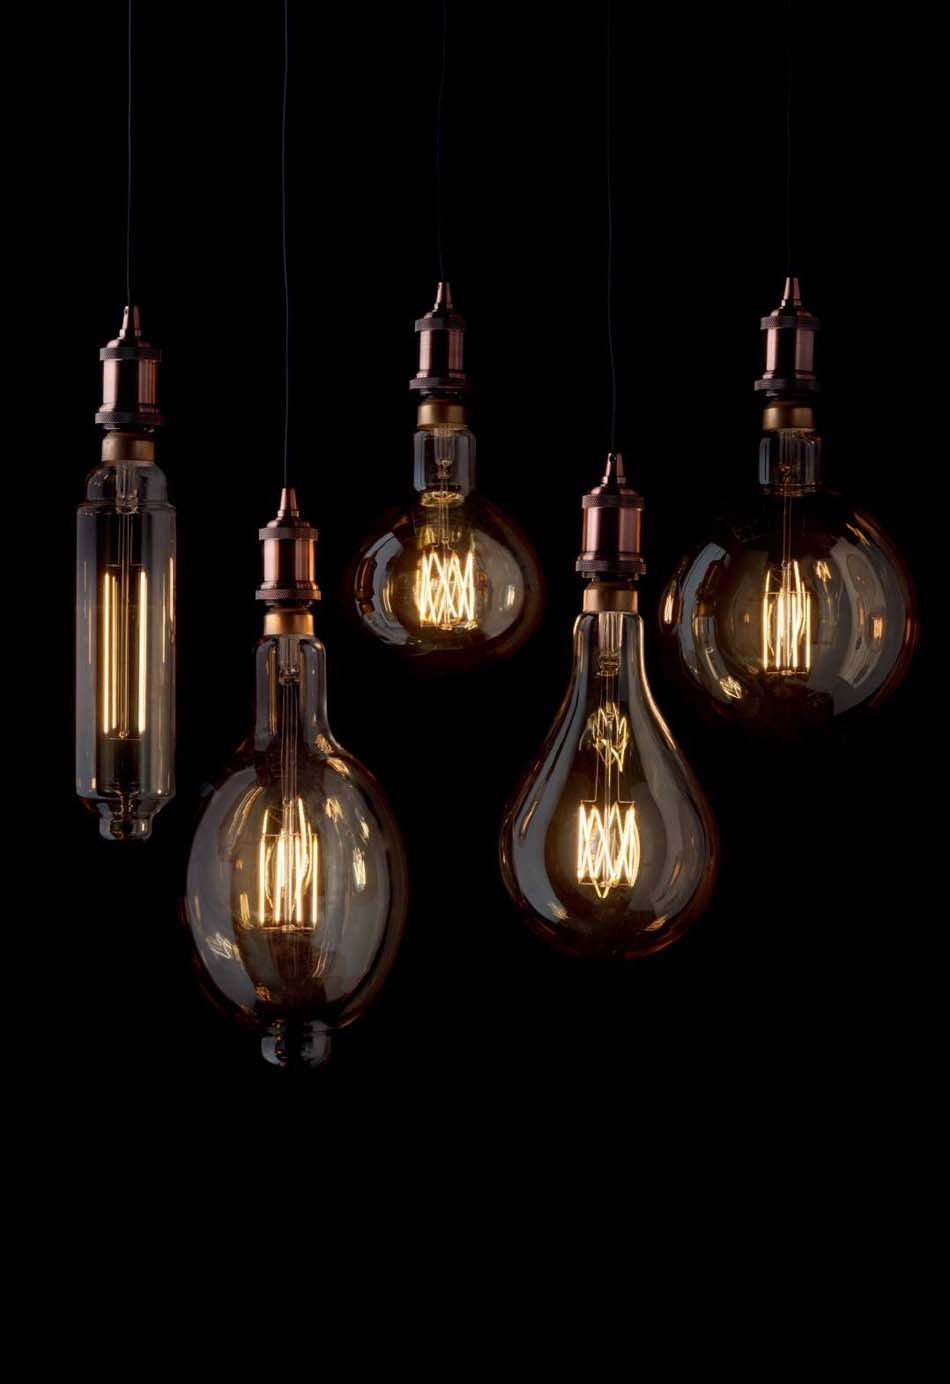 Lampade 54 sospensione Ideal Lux LED Vintage xl – Bruni Arredamenti